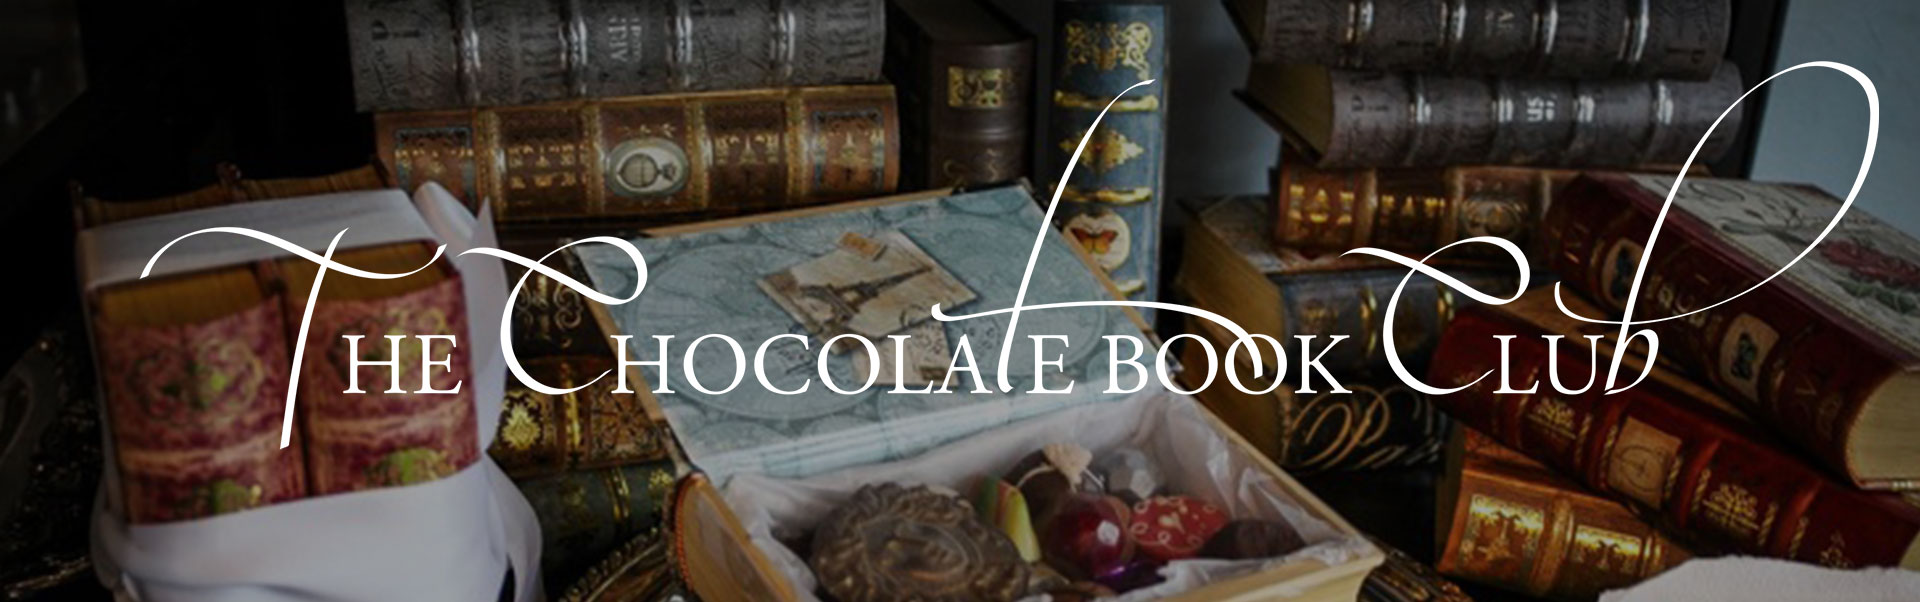 chocolat_book_club_header.jpg